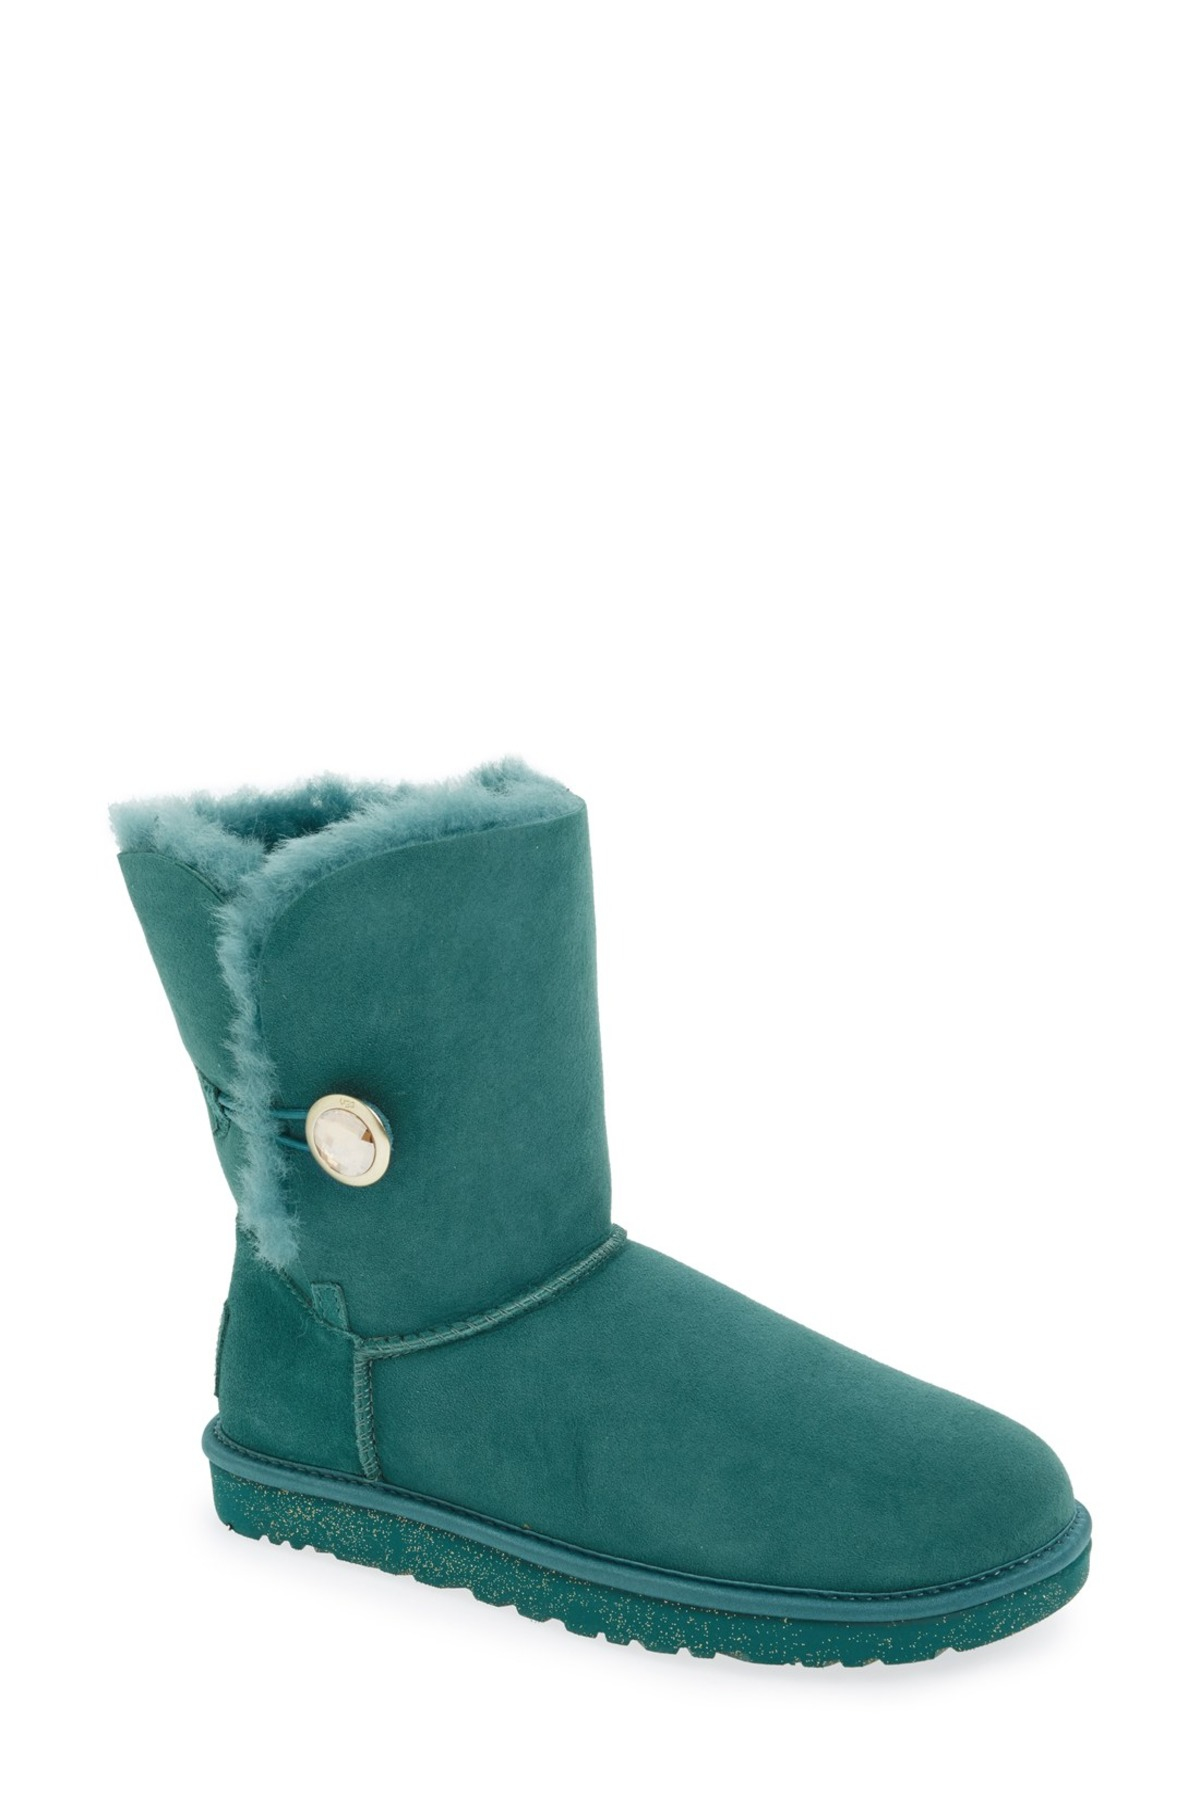 885e4b71851 UGG Green Bailey Button Ornate Genuine Shearling Lining Boot